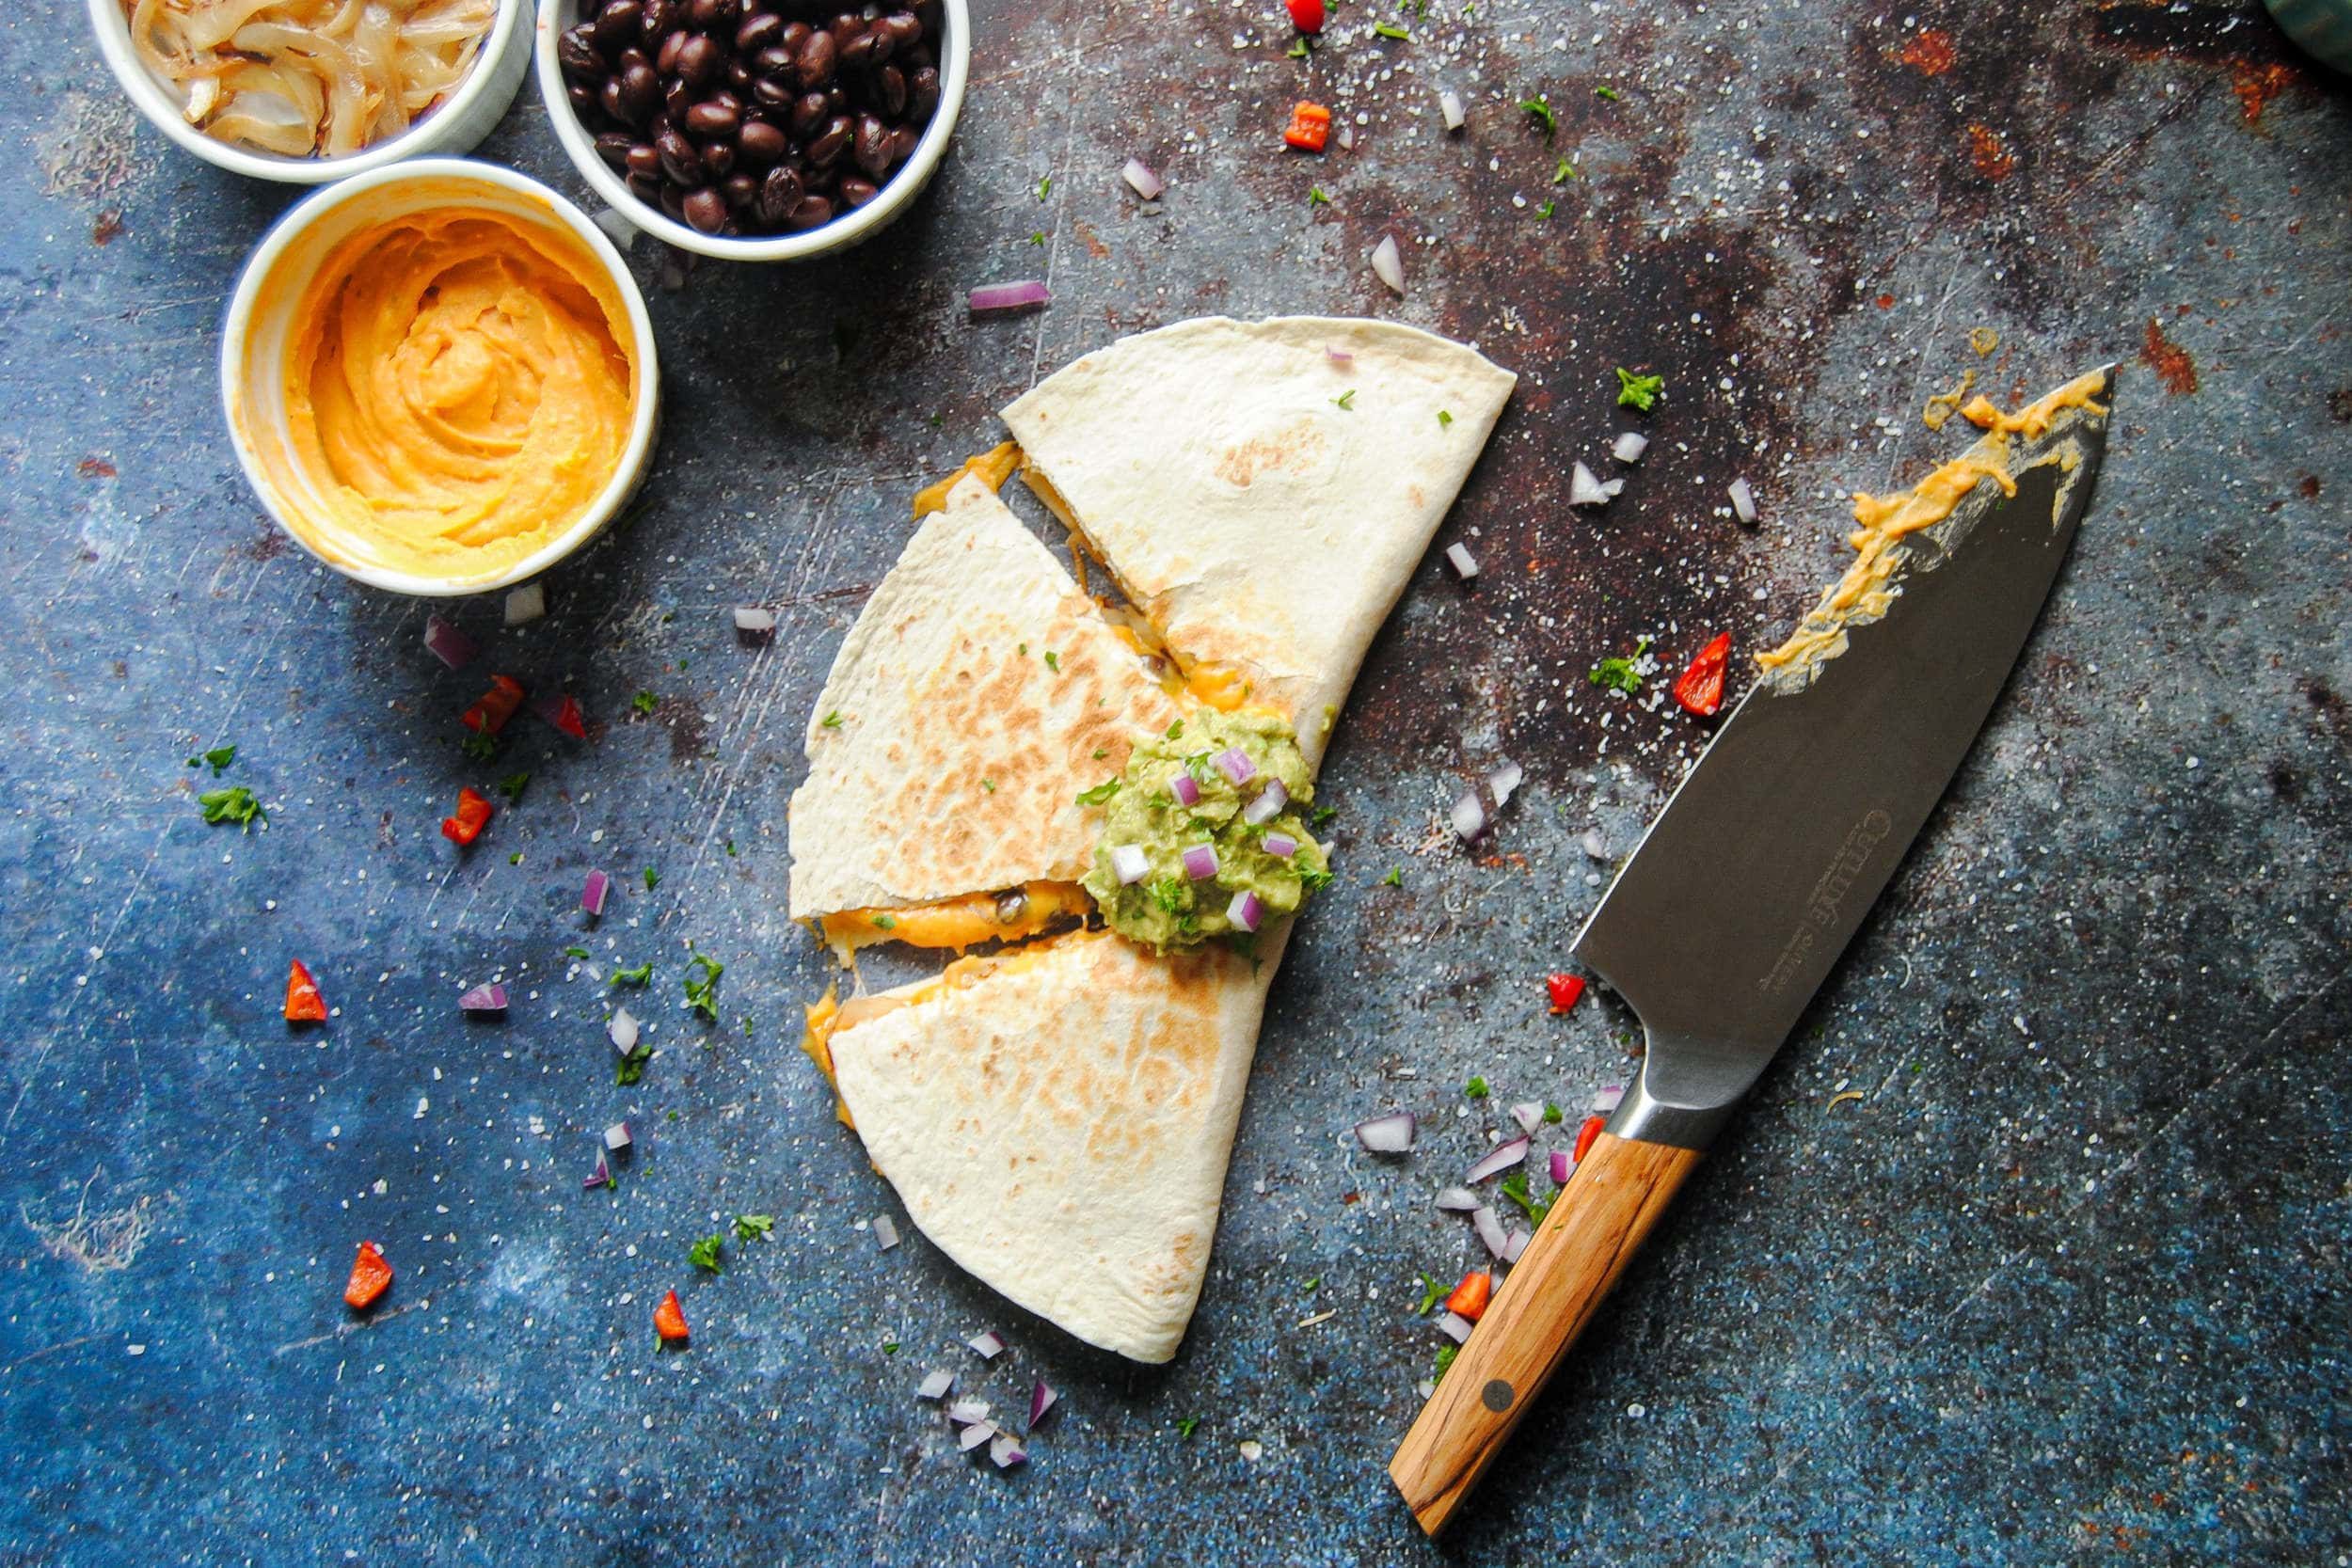 Overhead shot of sweet potato quesadilla with knife